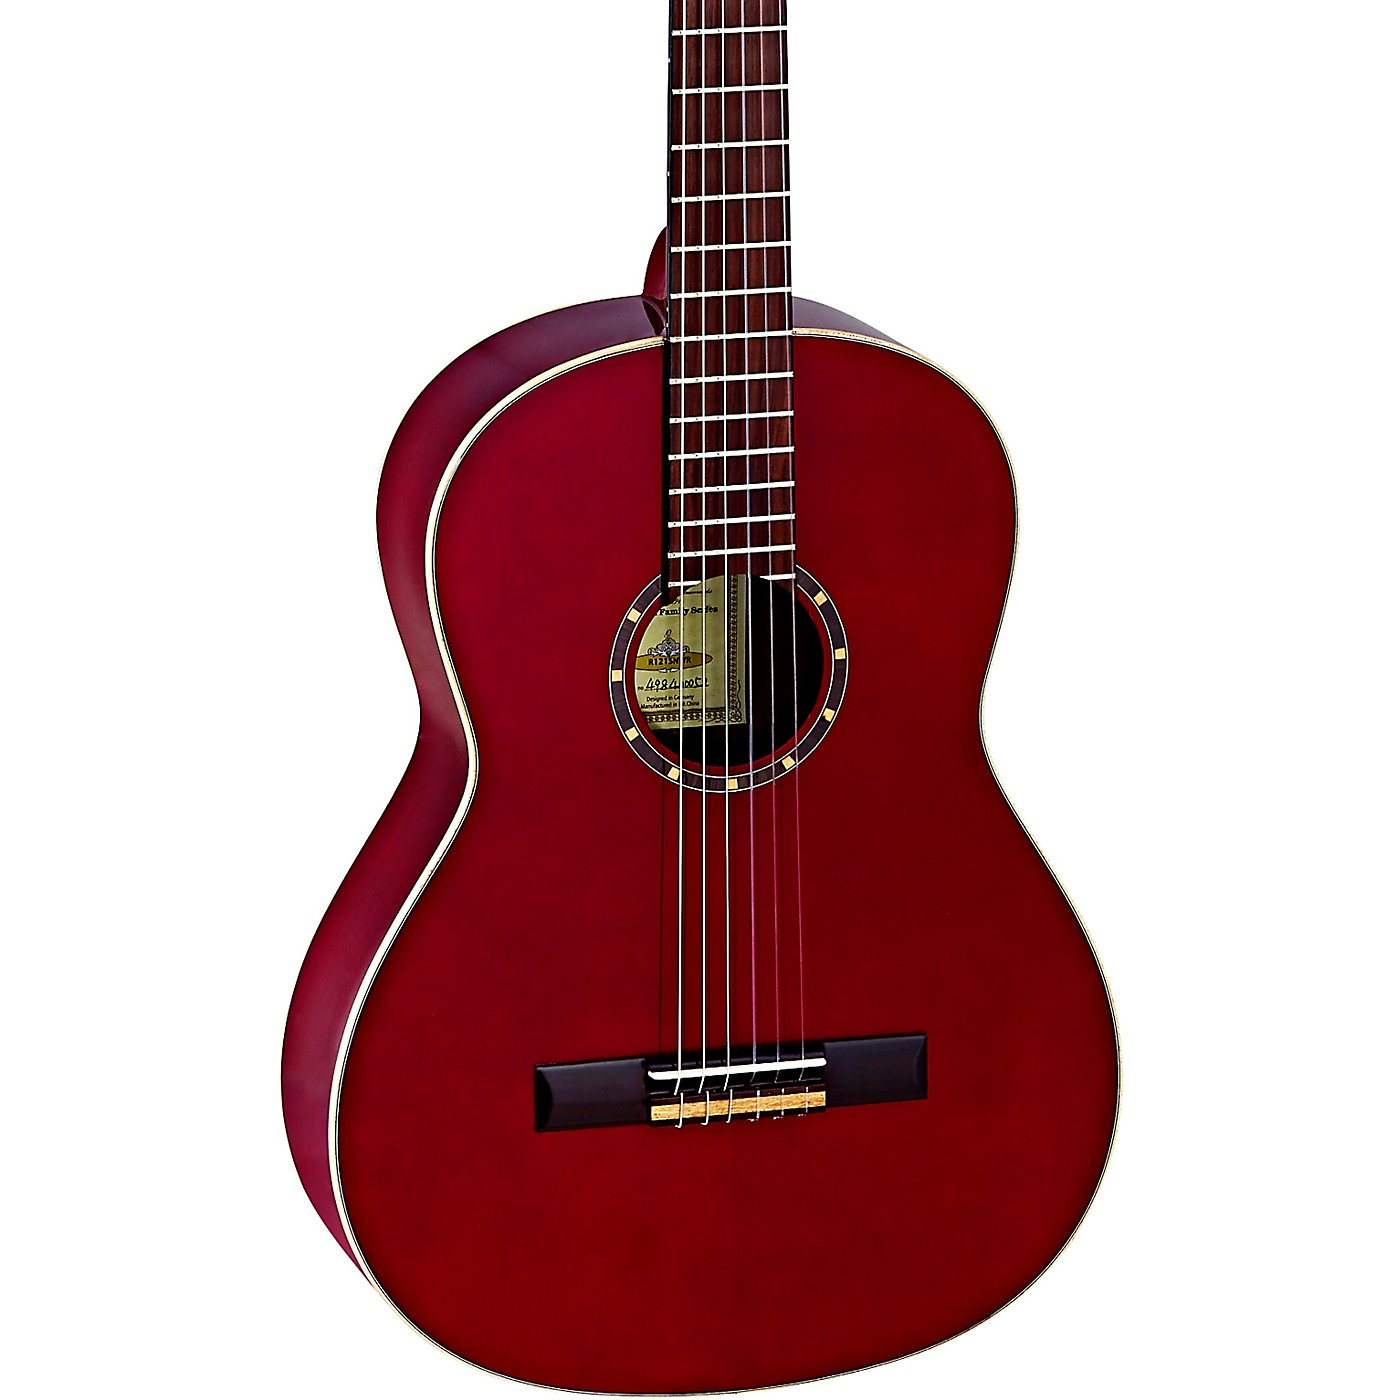 Ortega Family Series R121SNWR Slim Neck Classical Guitar thumbnail